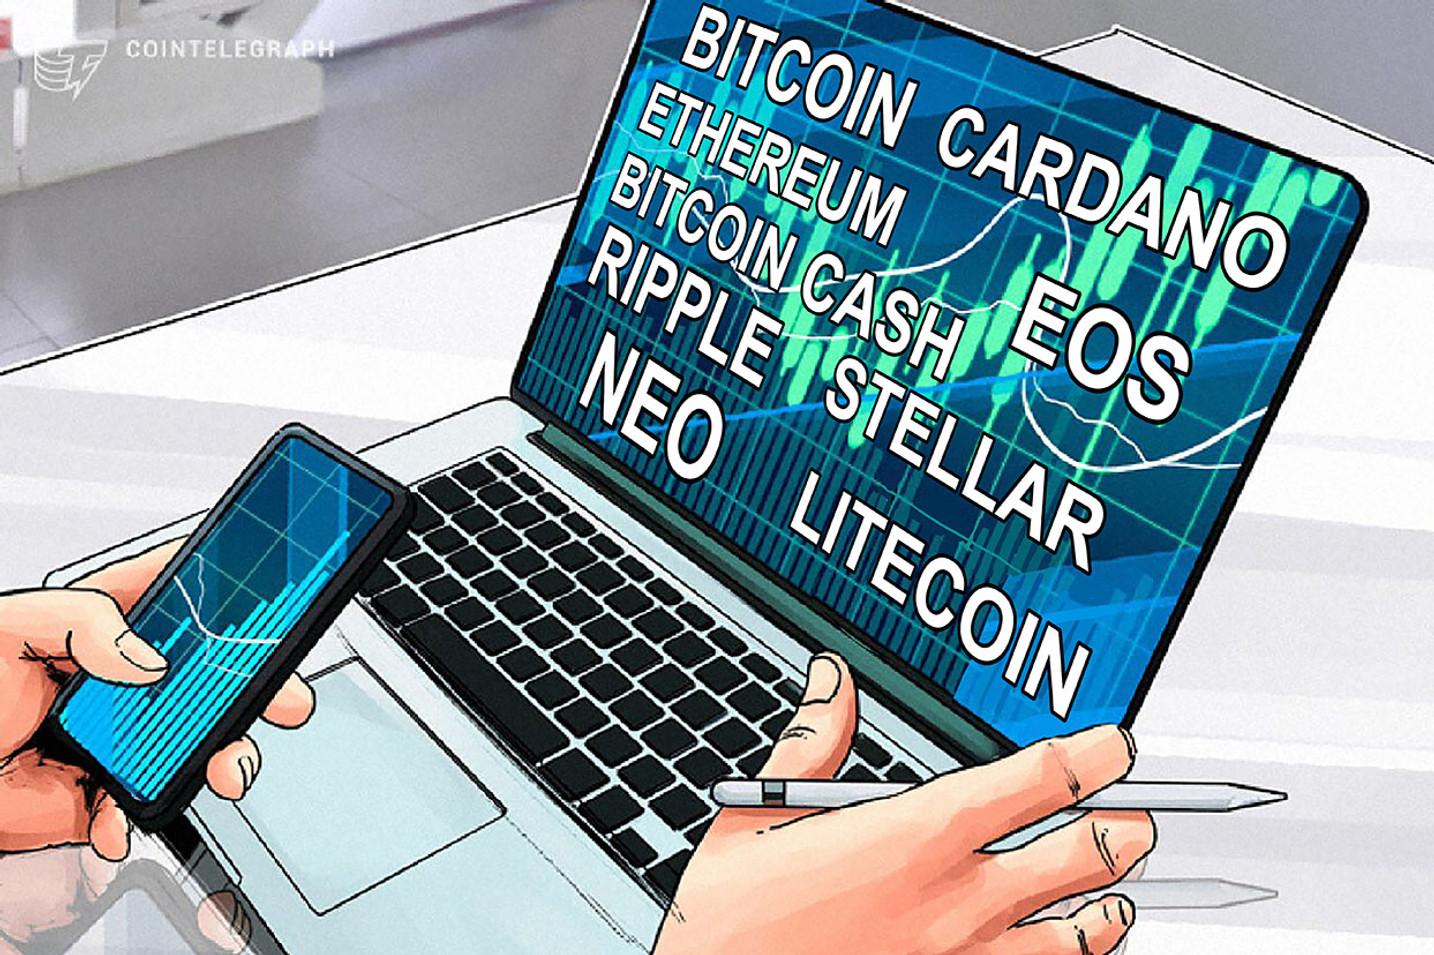 Bitcoin, Ethereum, Bitcoin Cash, Ripple, Stellar, Litecoin, Cardano, NEO, EOS: Analisi dei prezzi, 26 marzo